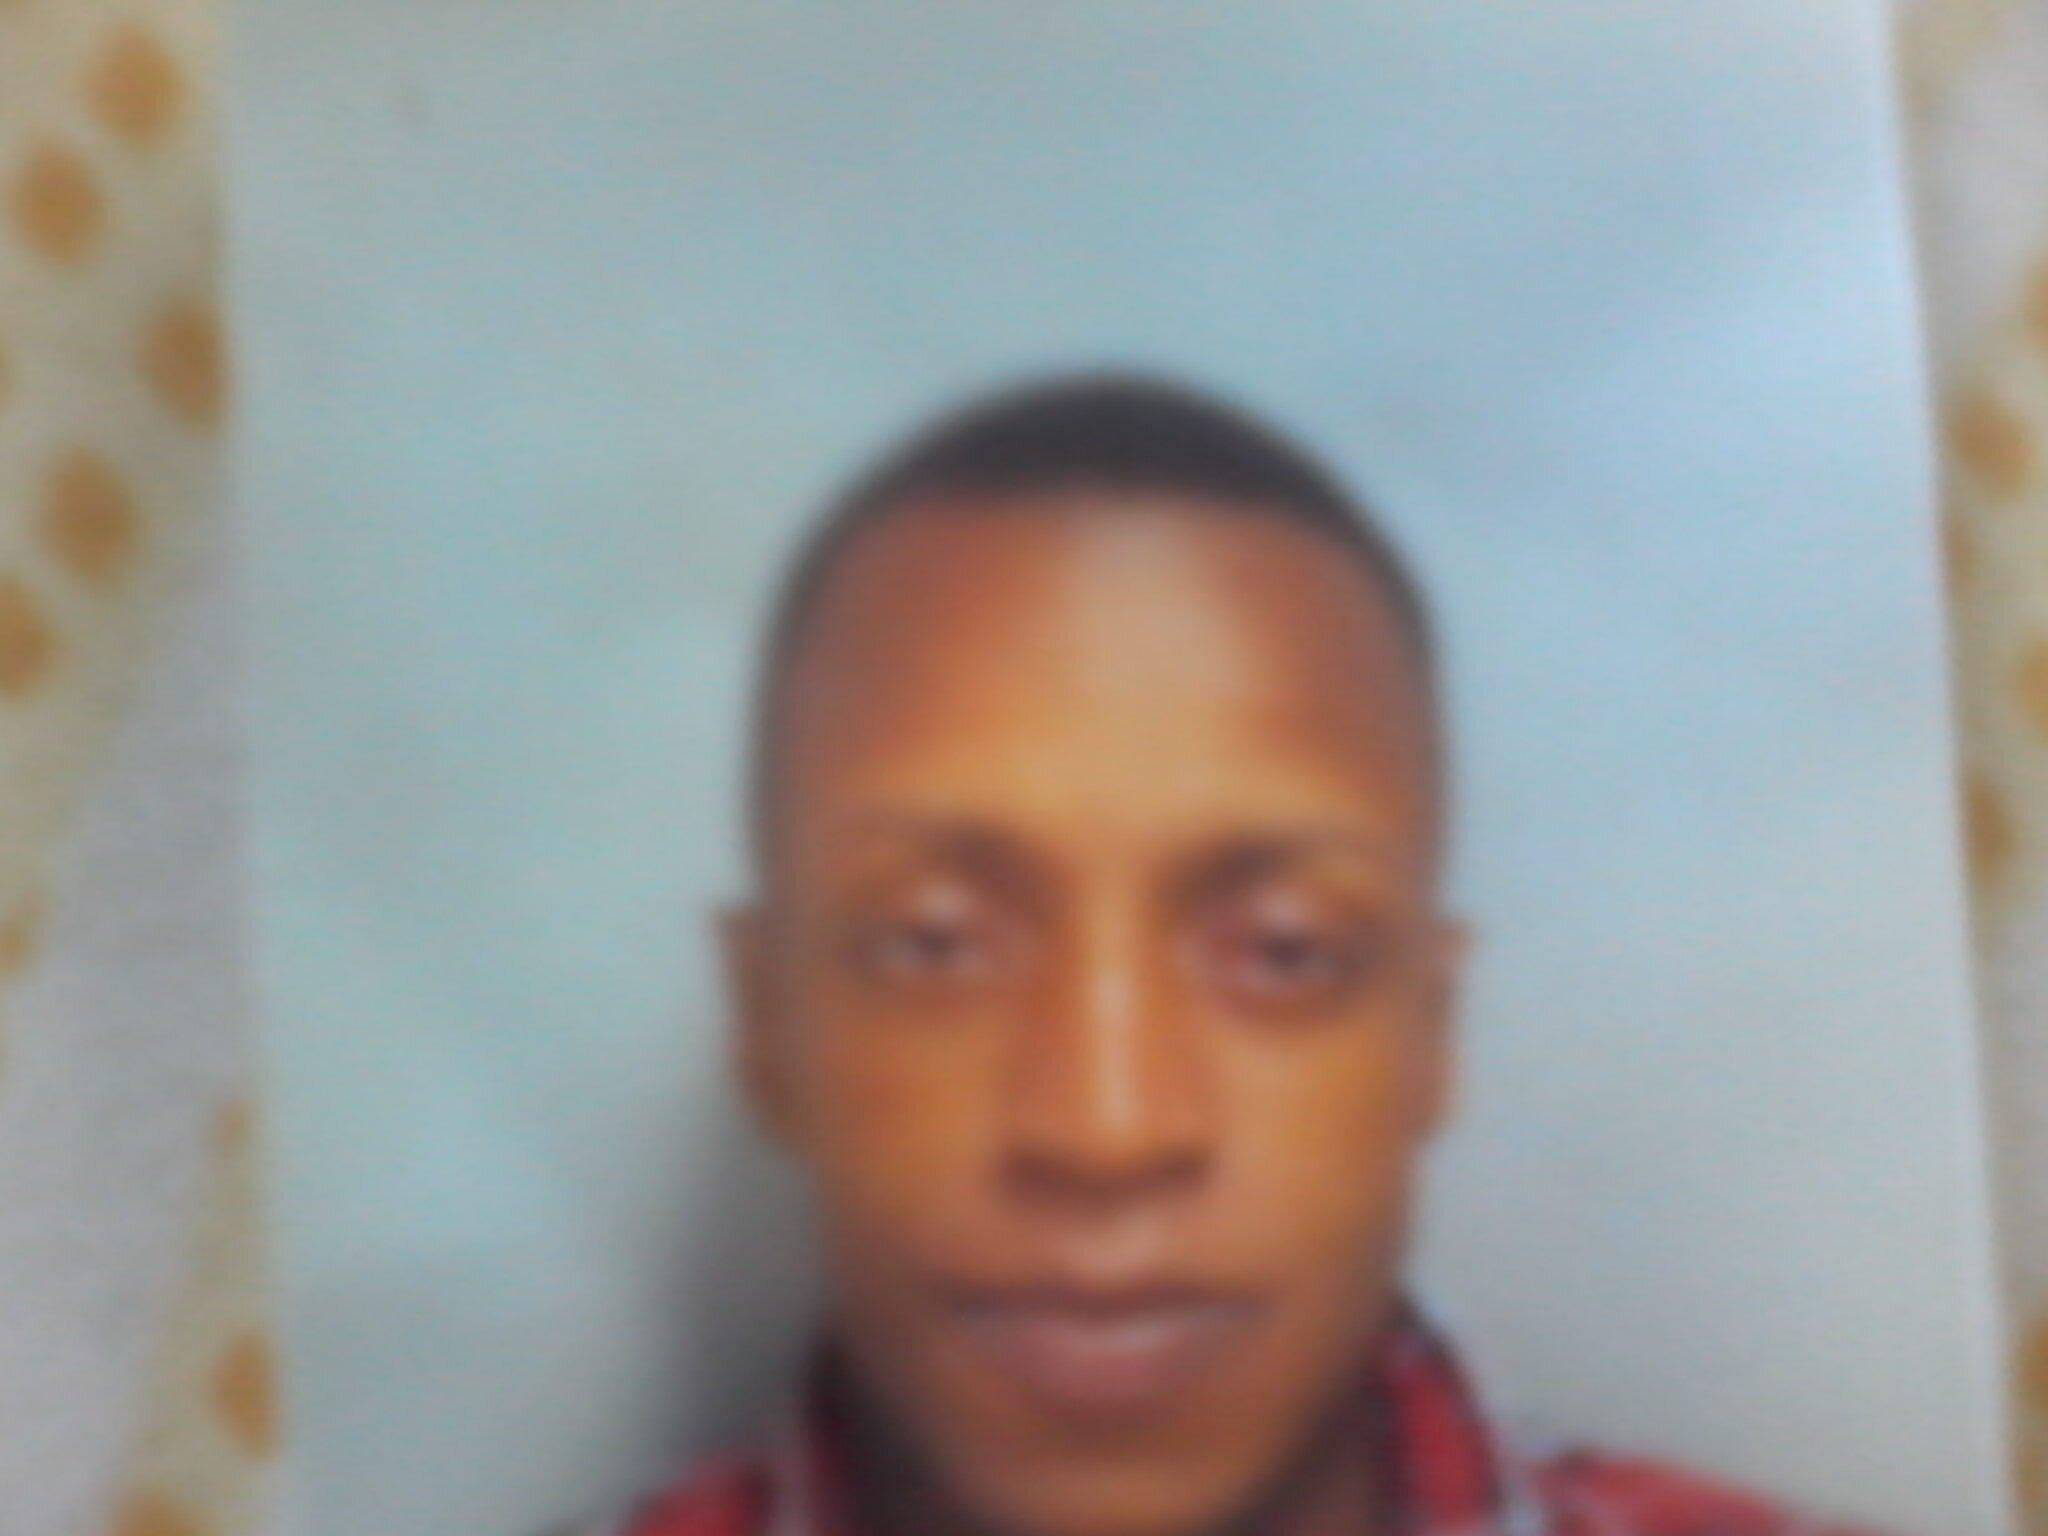 Barber_boy268